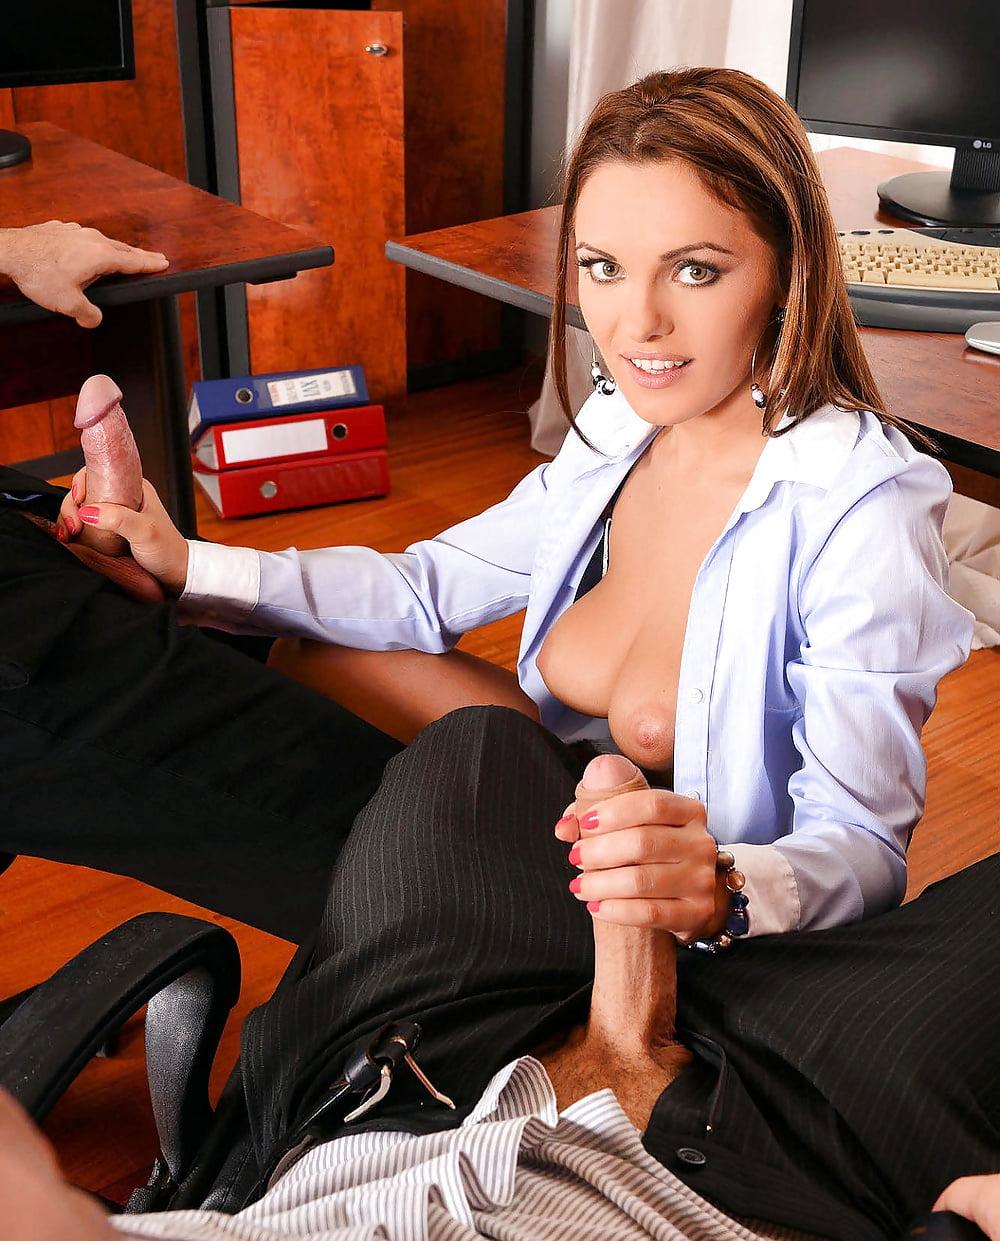 Office handjob pictures